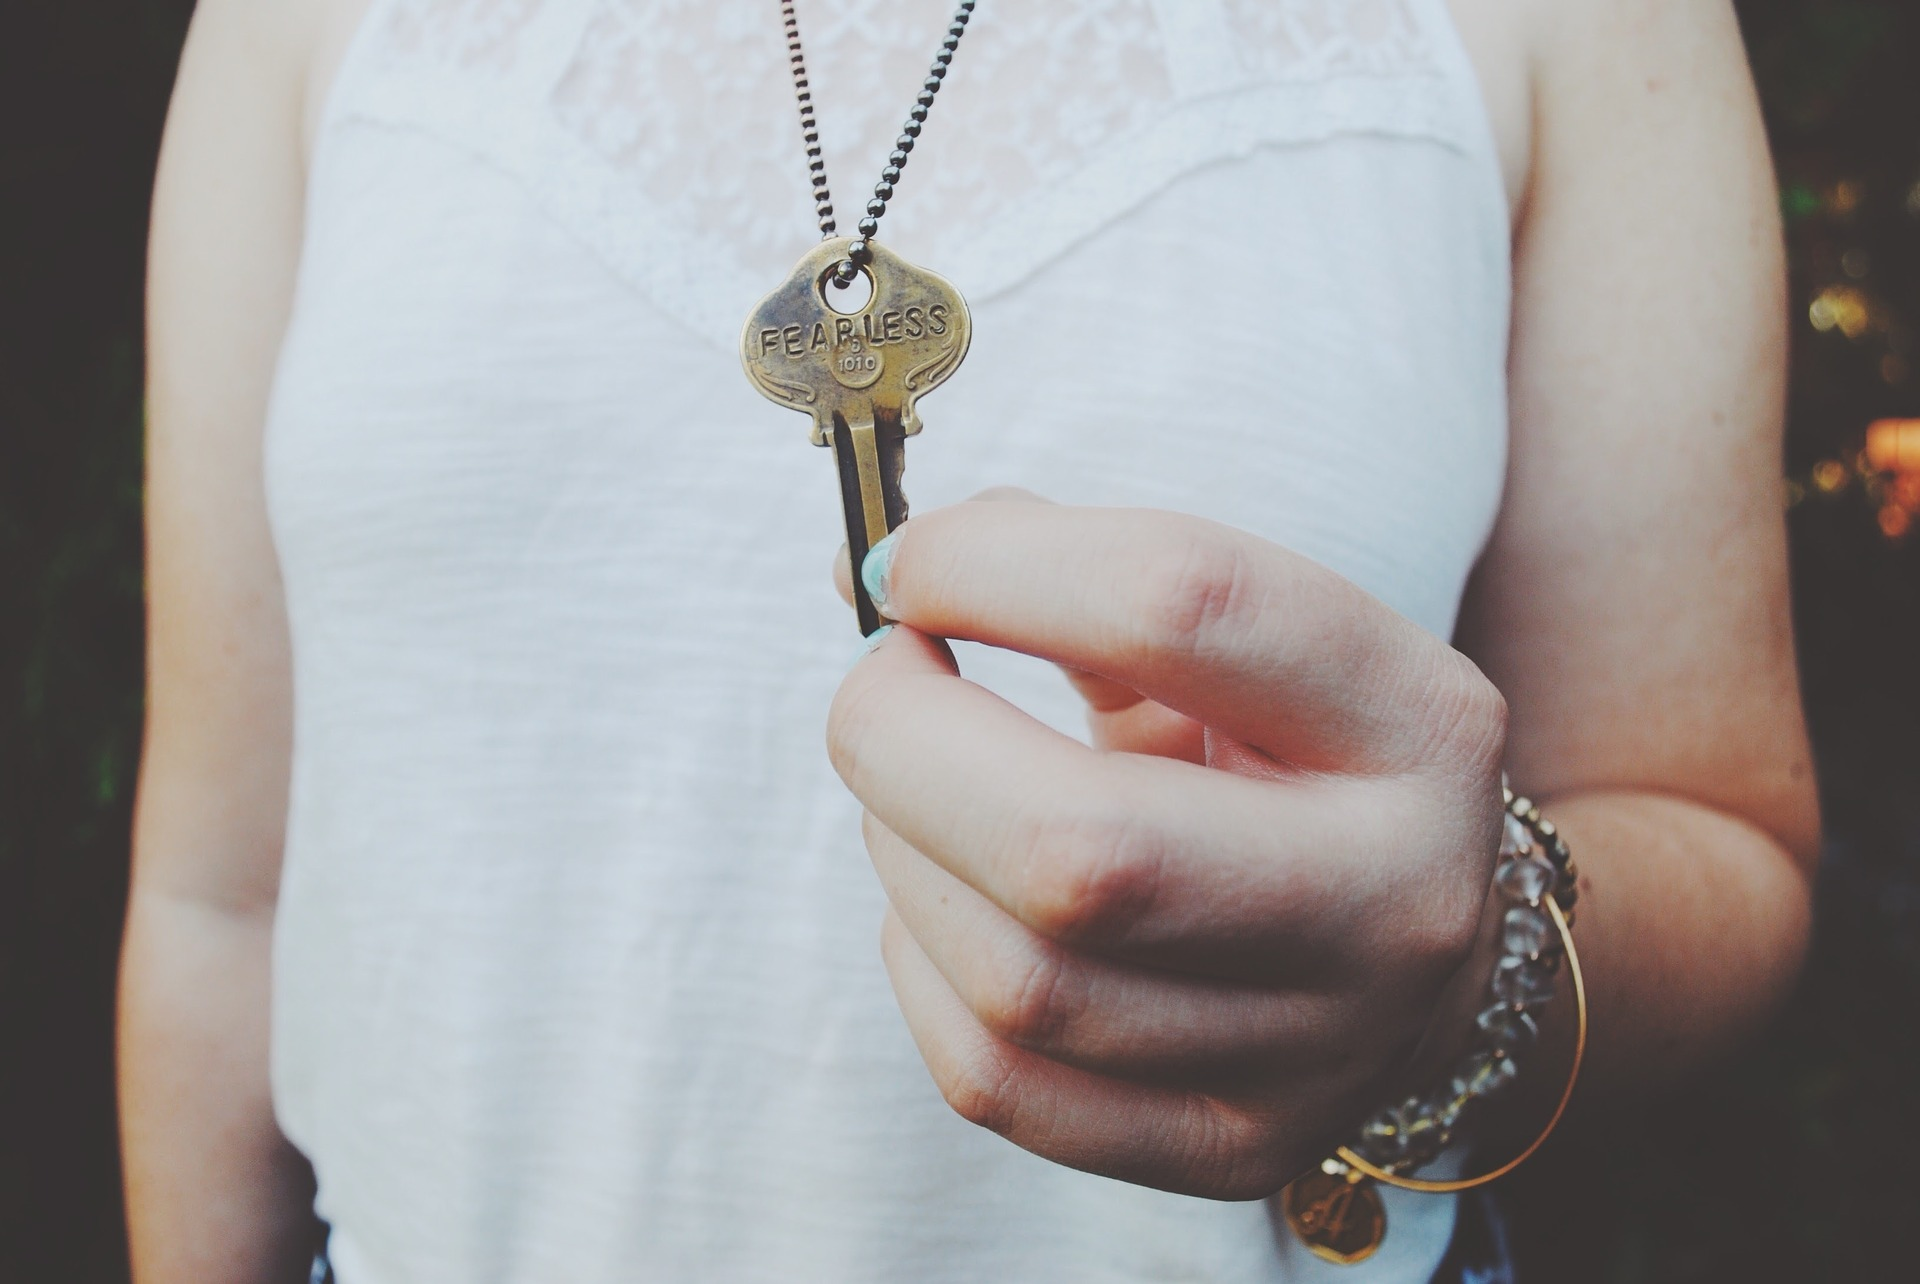 key-1148920_1920.jpg